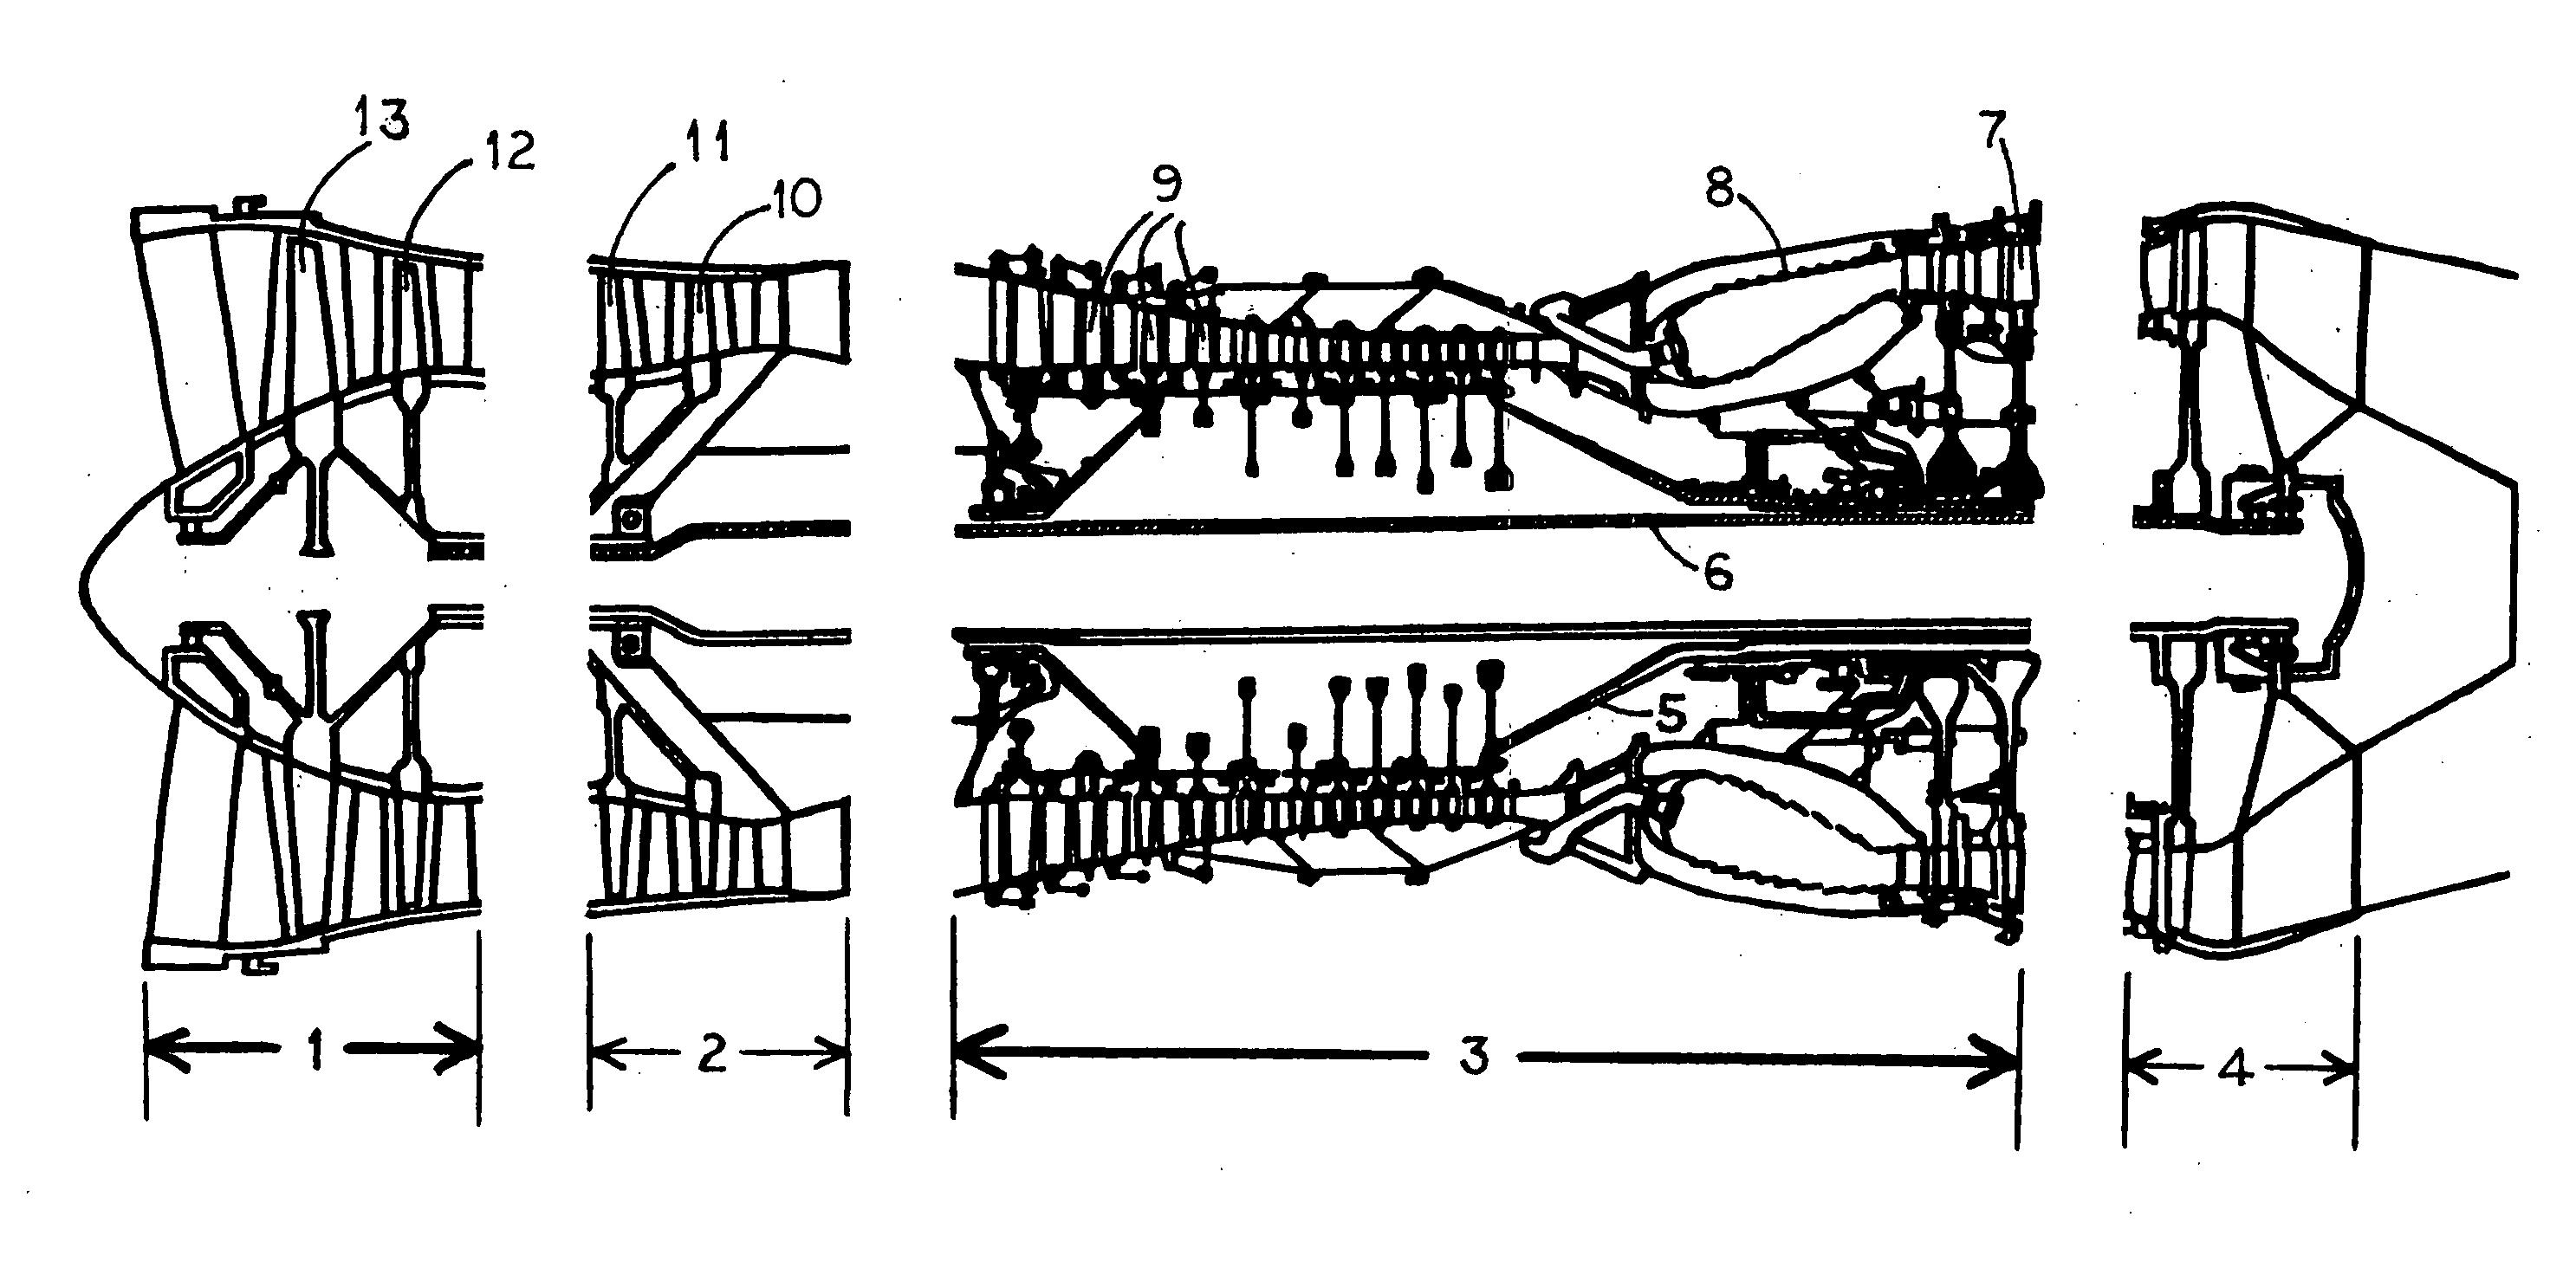 tf33 engine cutaway